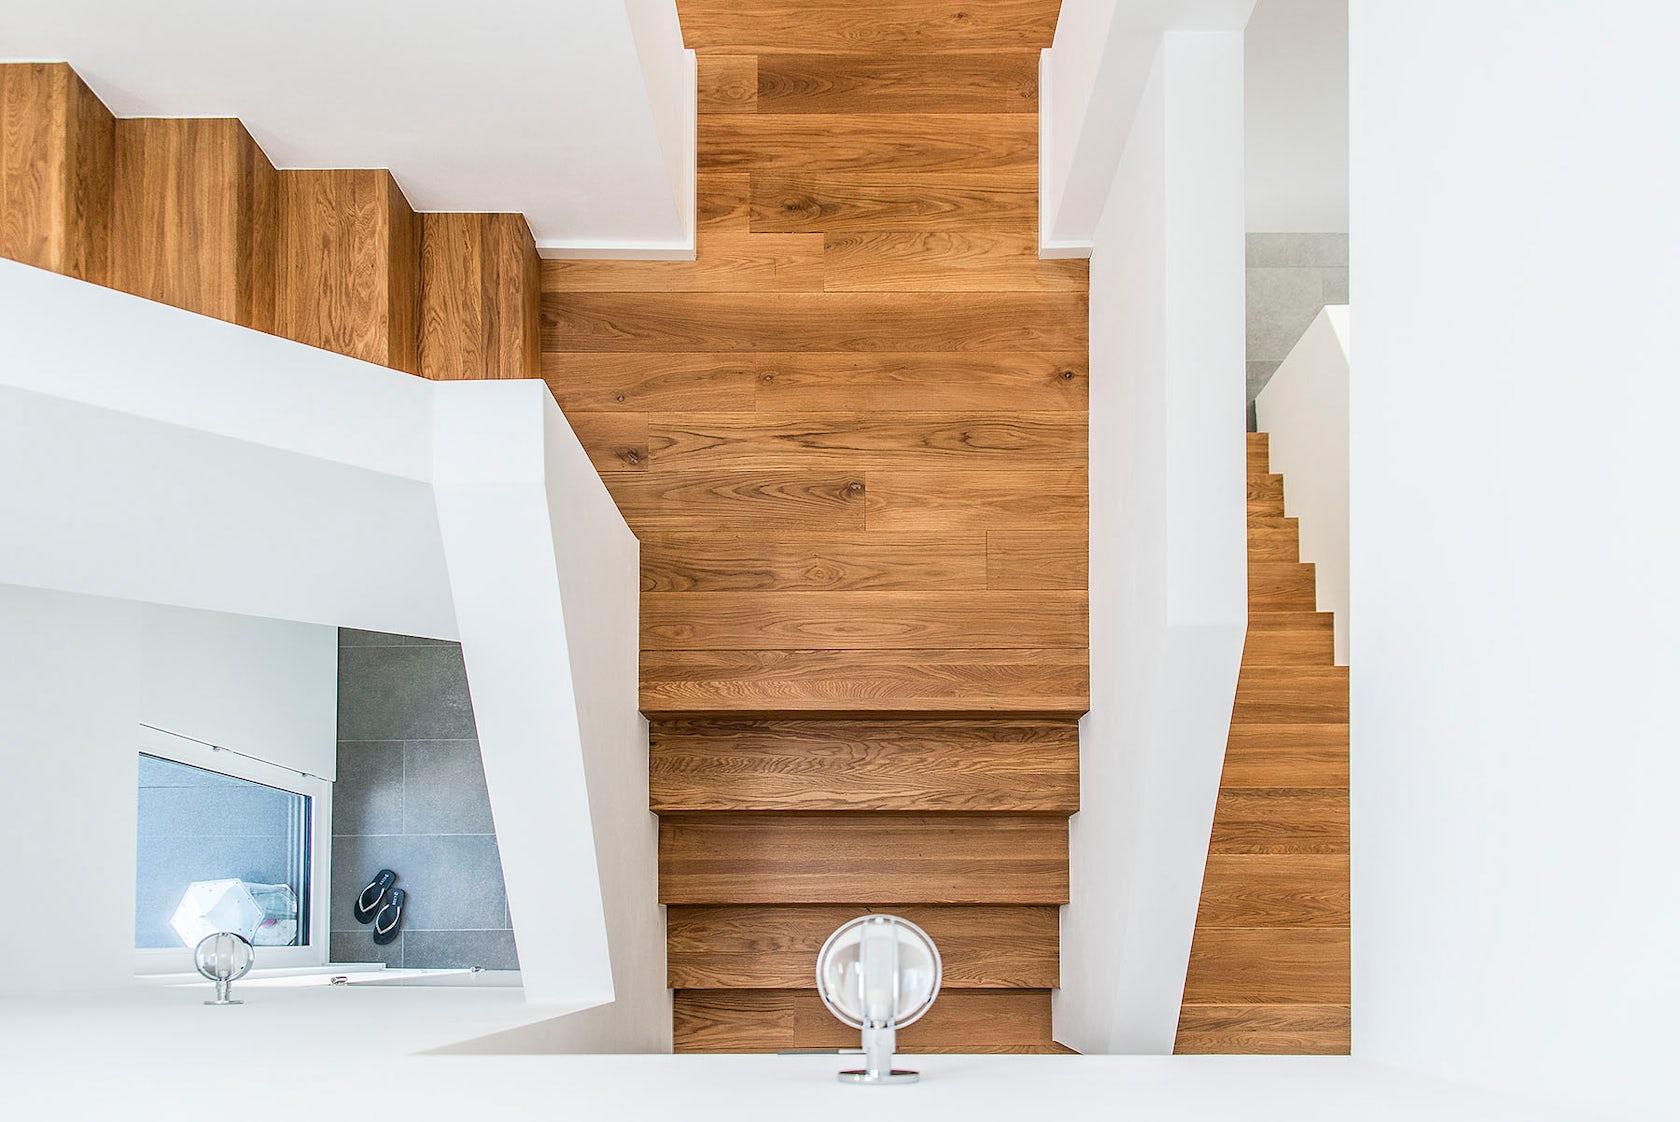 haus berge architizer. Black Bedroom Furniture Sets. Home Design Ideas